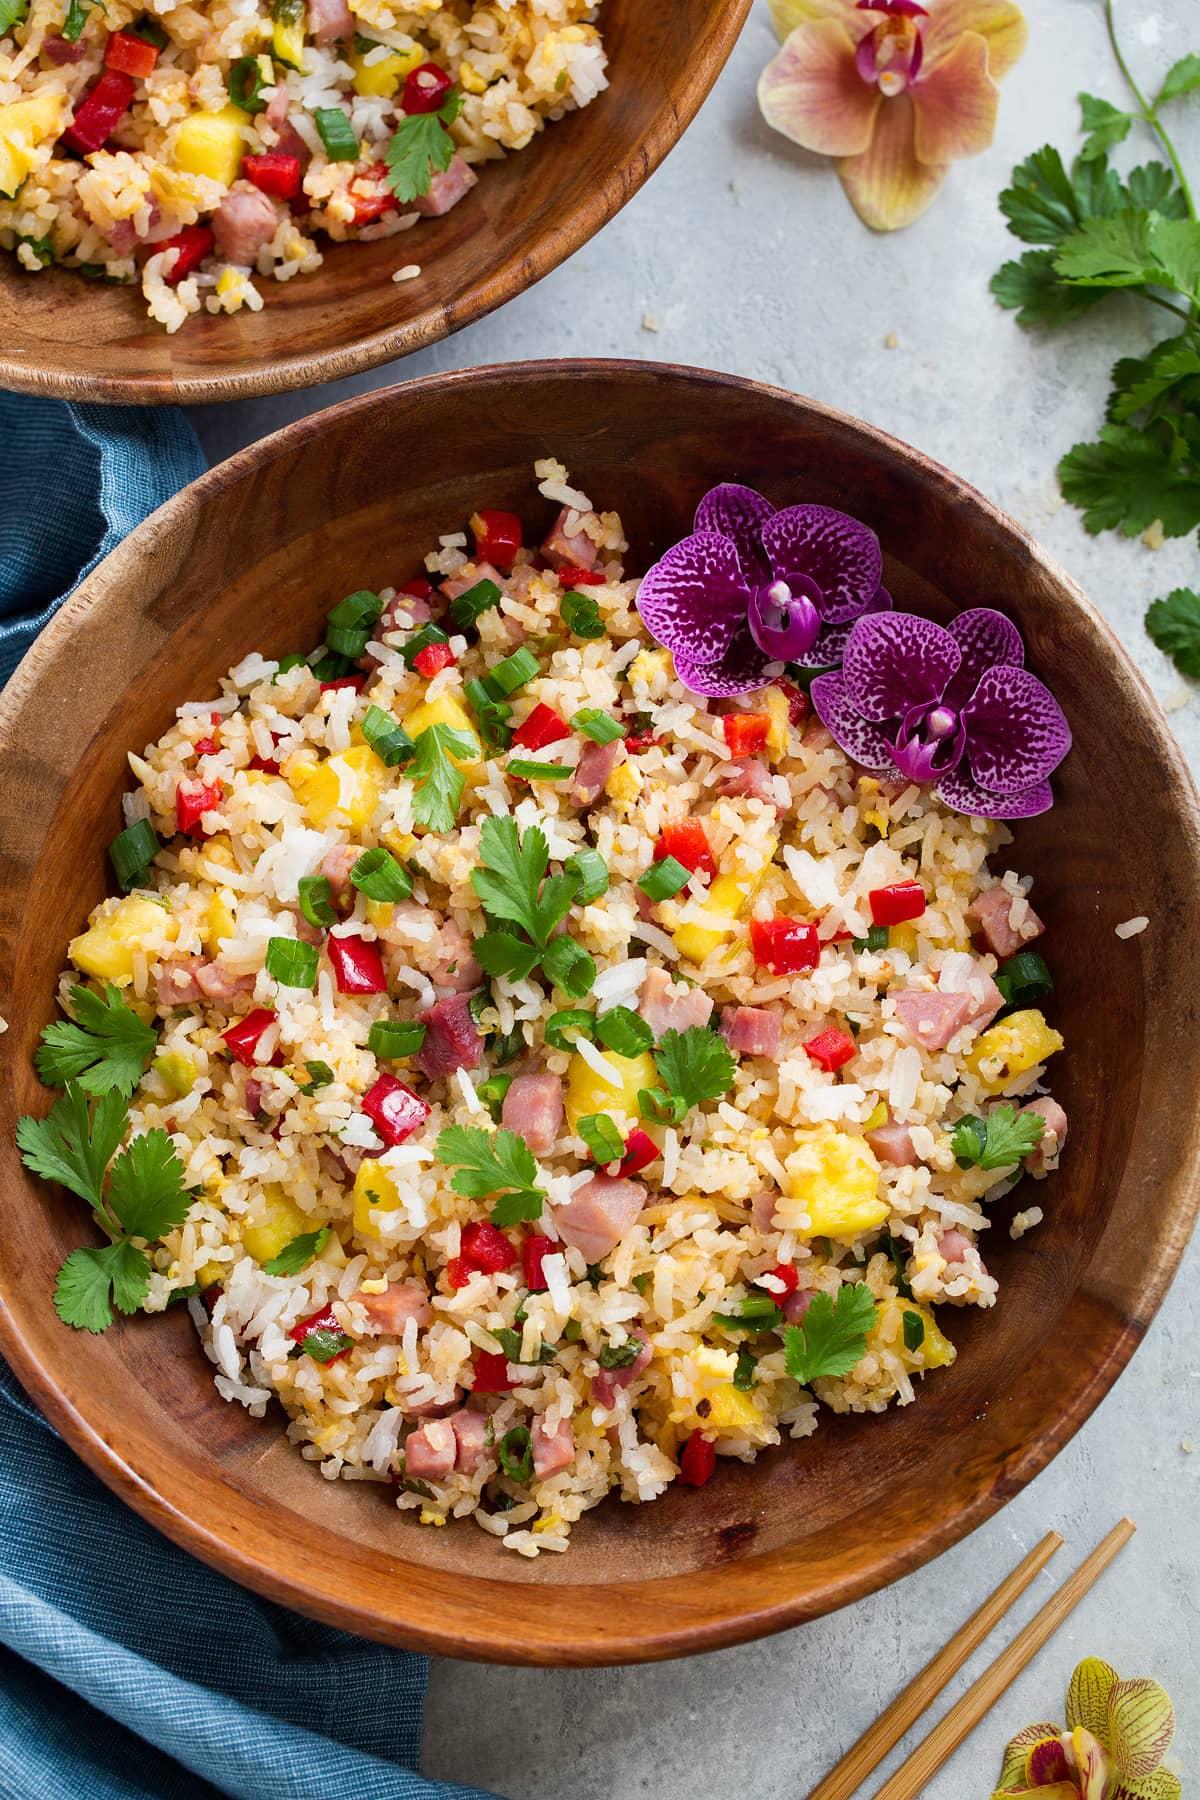 Overhead image of hawaiian fried rice in a bowl.